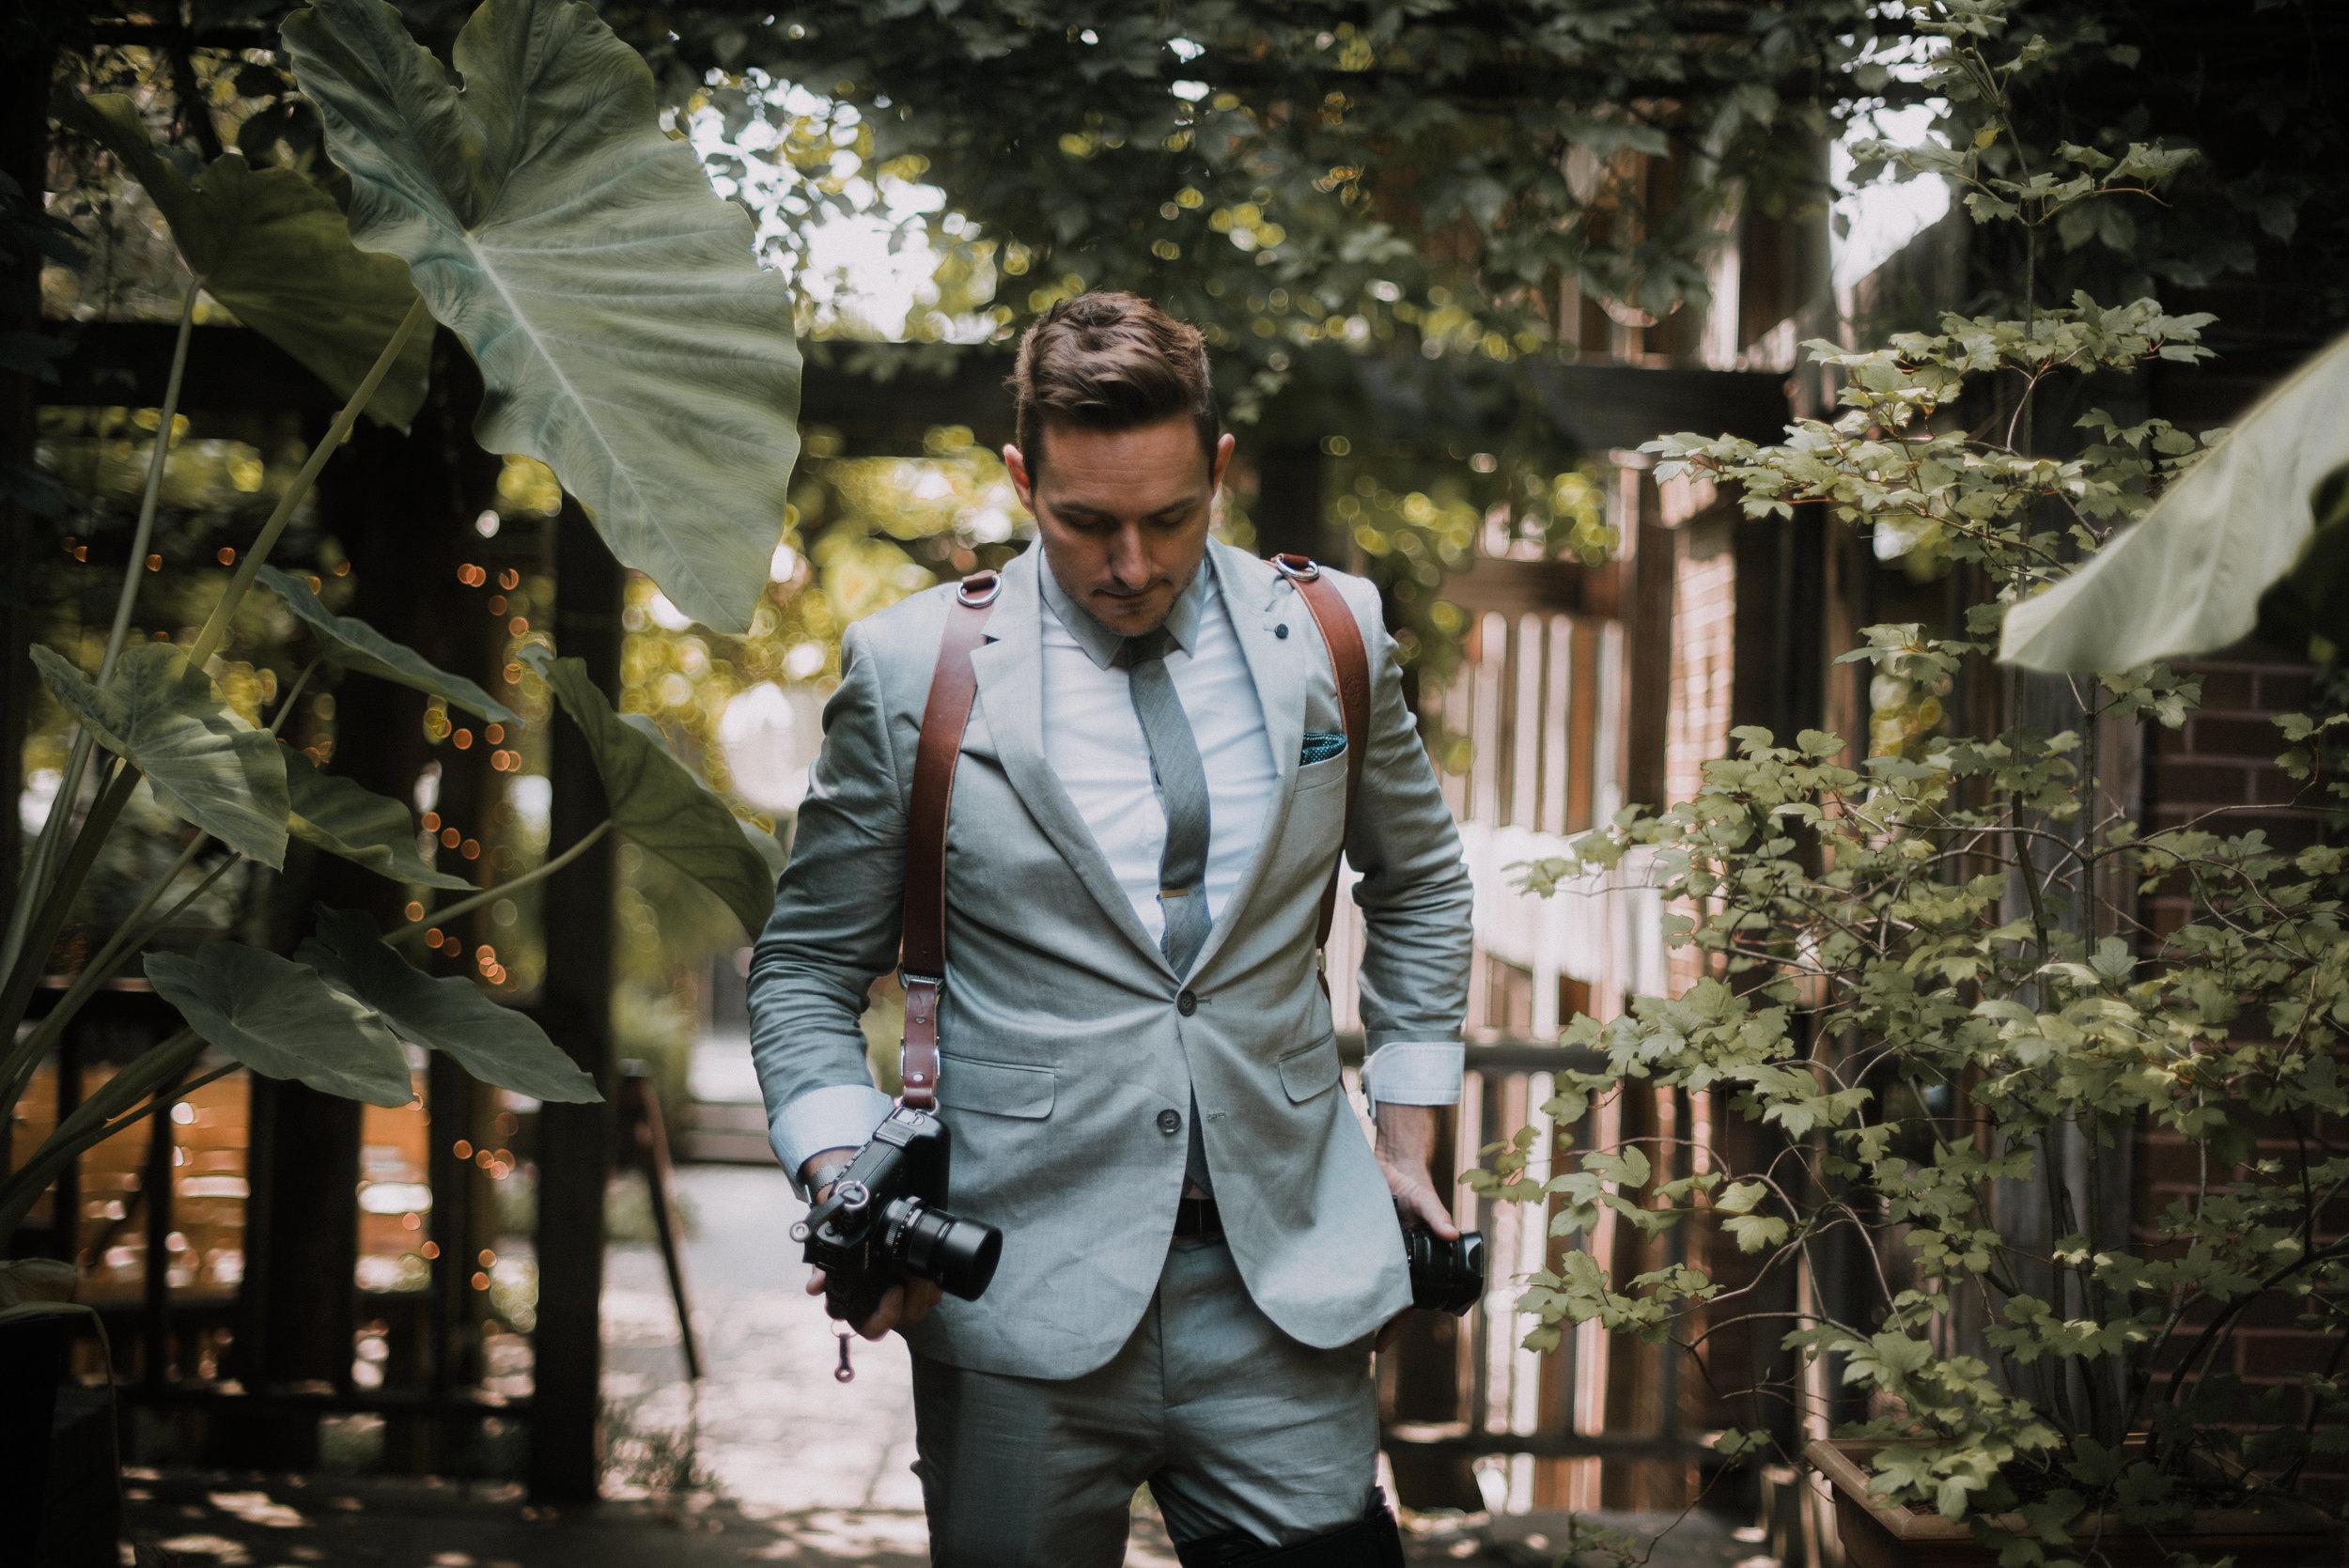 jennaandrew.2017mileswittboyer.weddingday-244.jpg